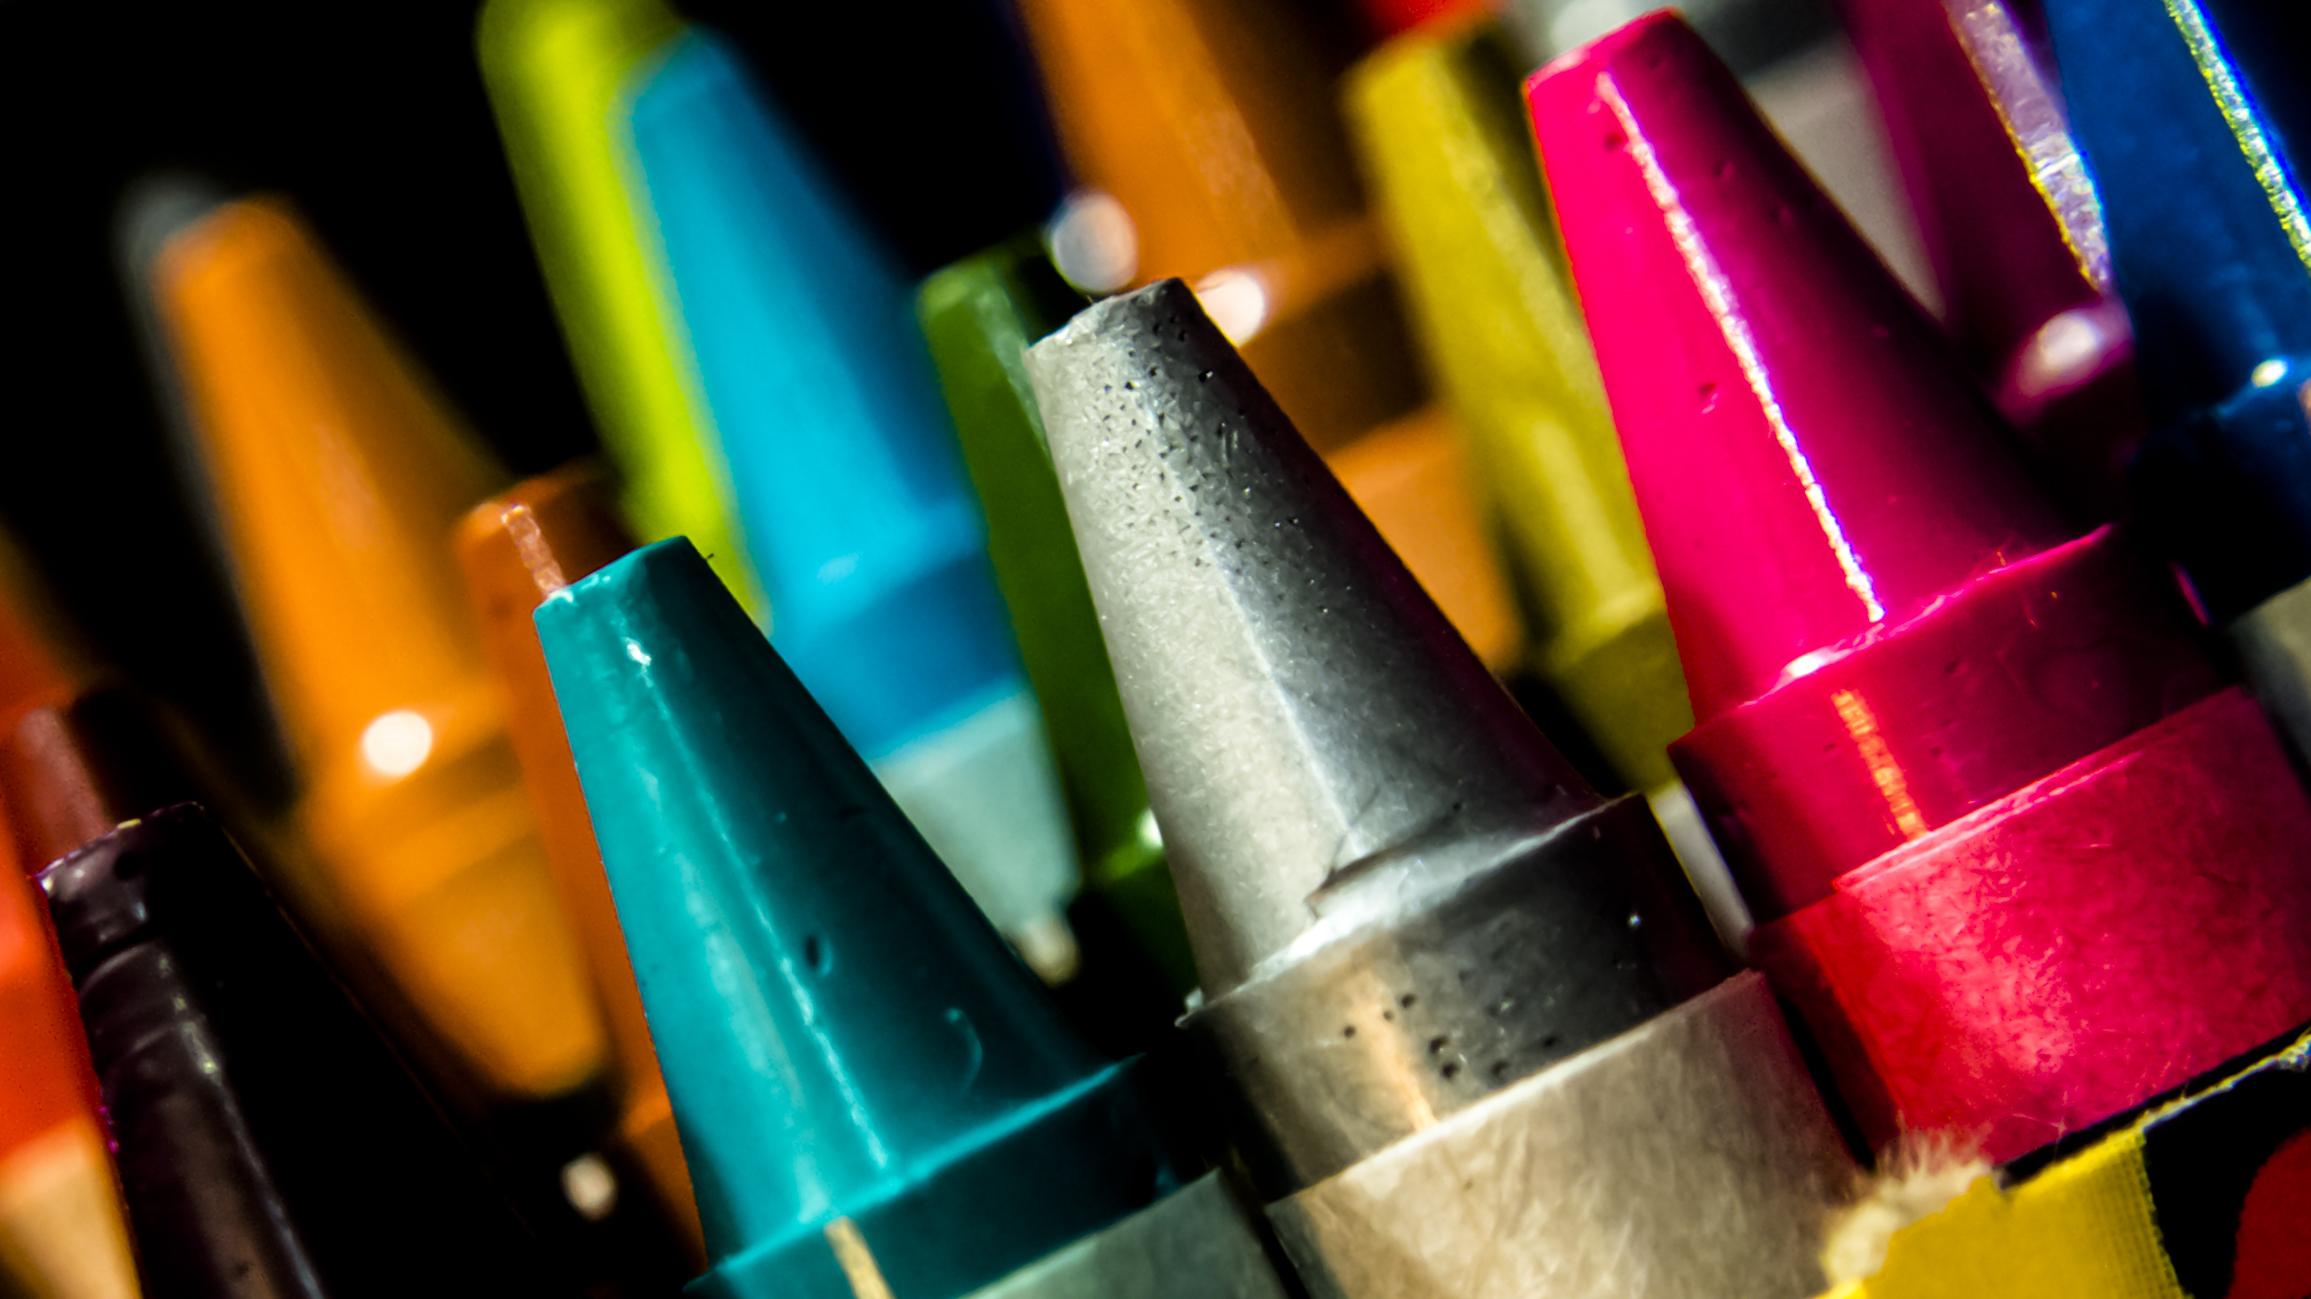 Fotos gratis : ligero, púrpura, naranja, verde, rojo, azul, negro ...